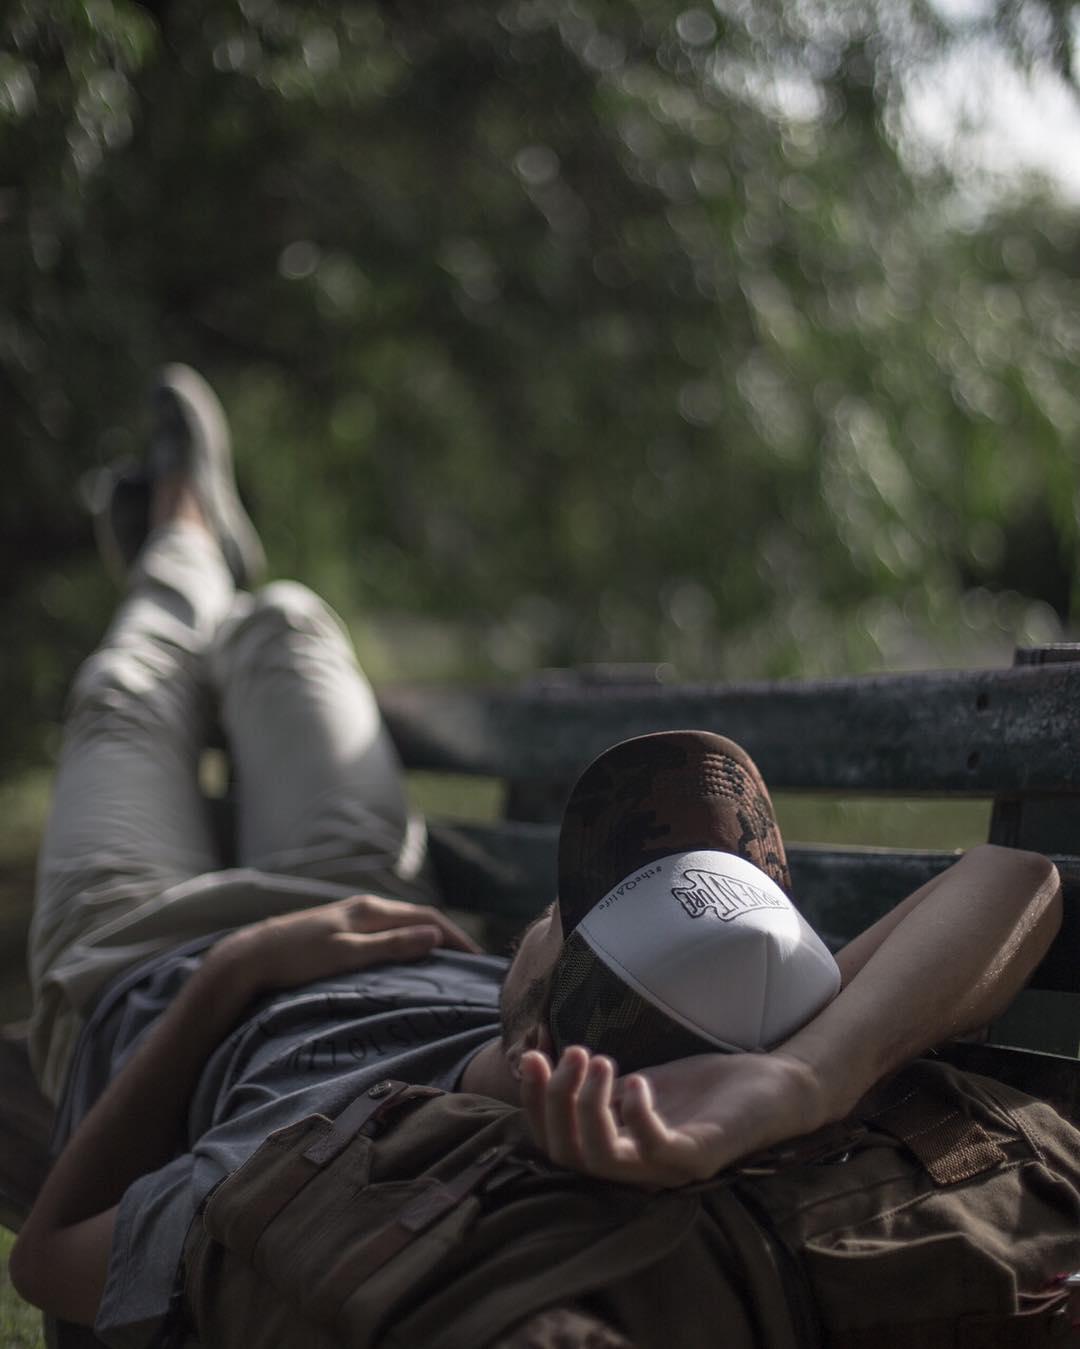 Tomate 5 minutos, dormite una siestita al sol. · #theQAlife ·